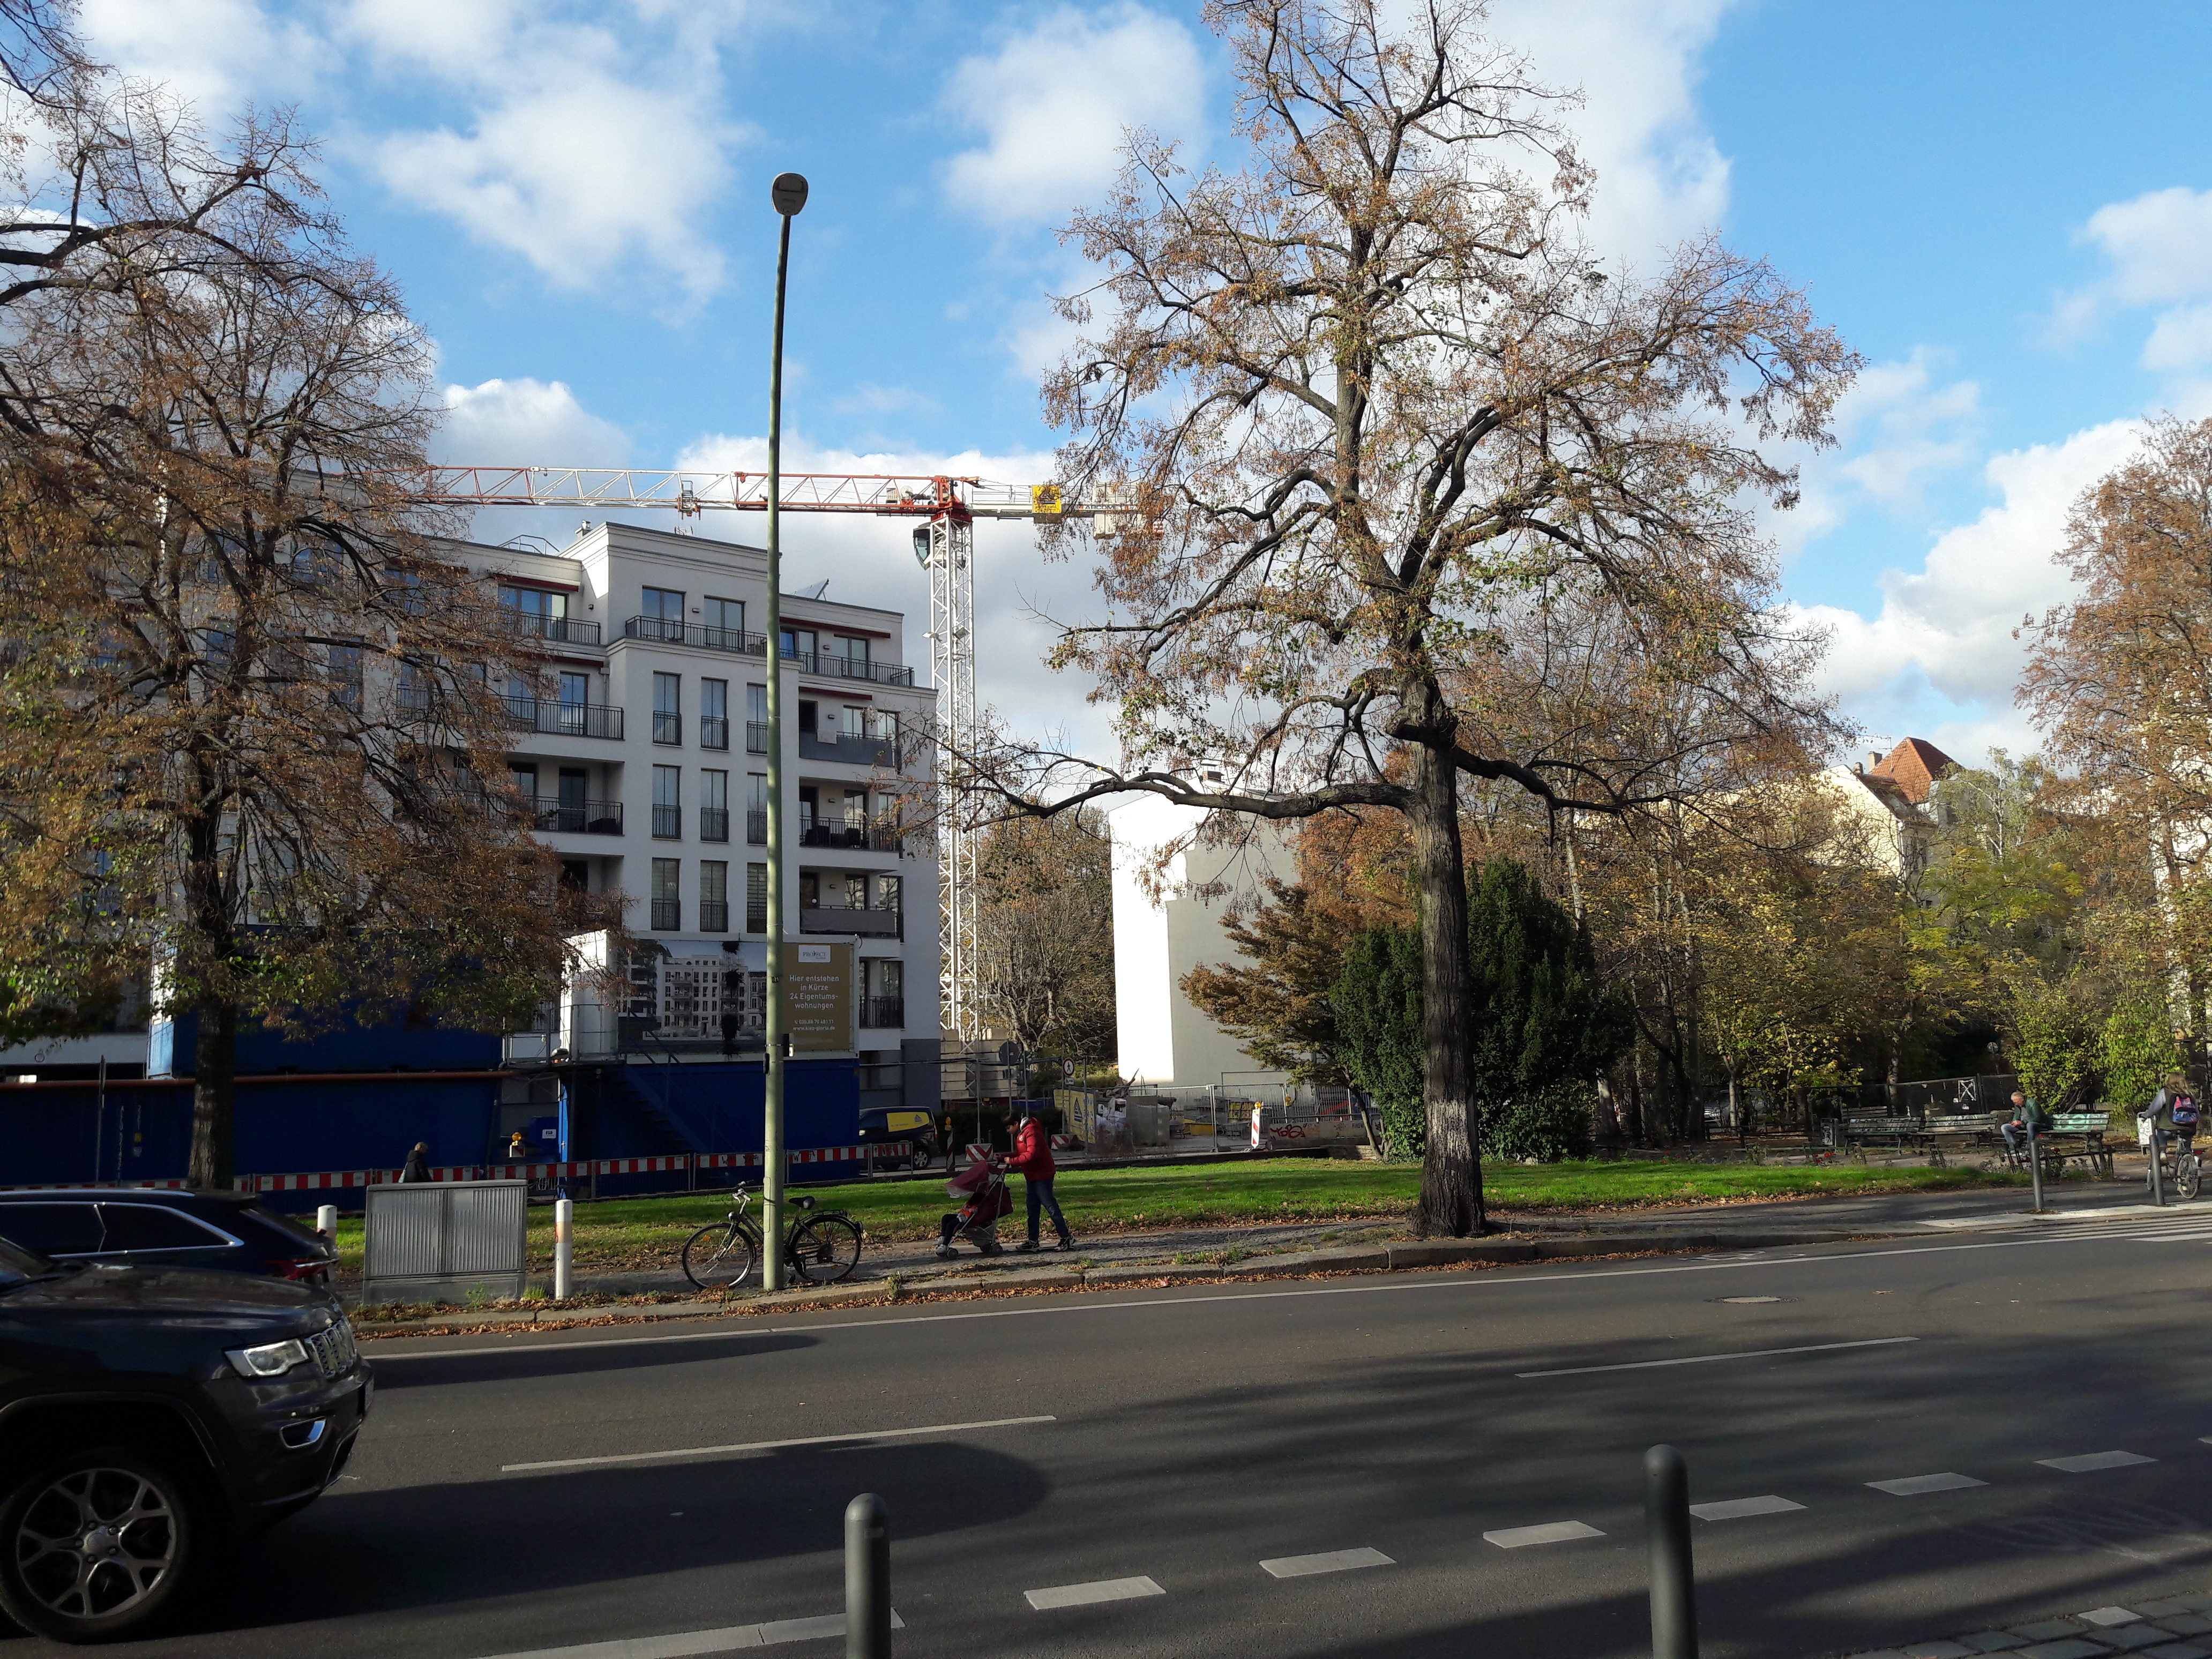 Neubau-Pankow-Baustelle.jpg